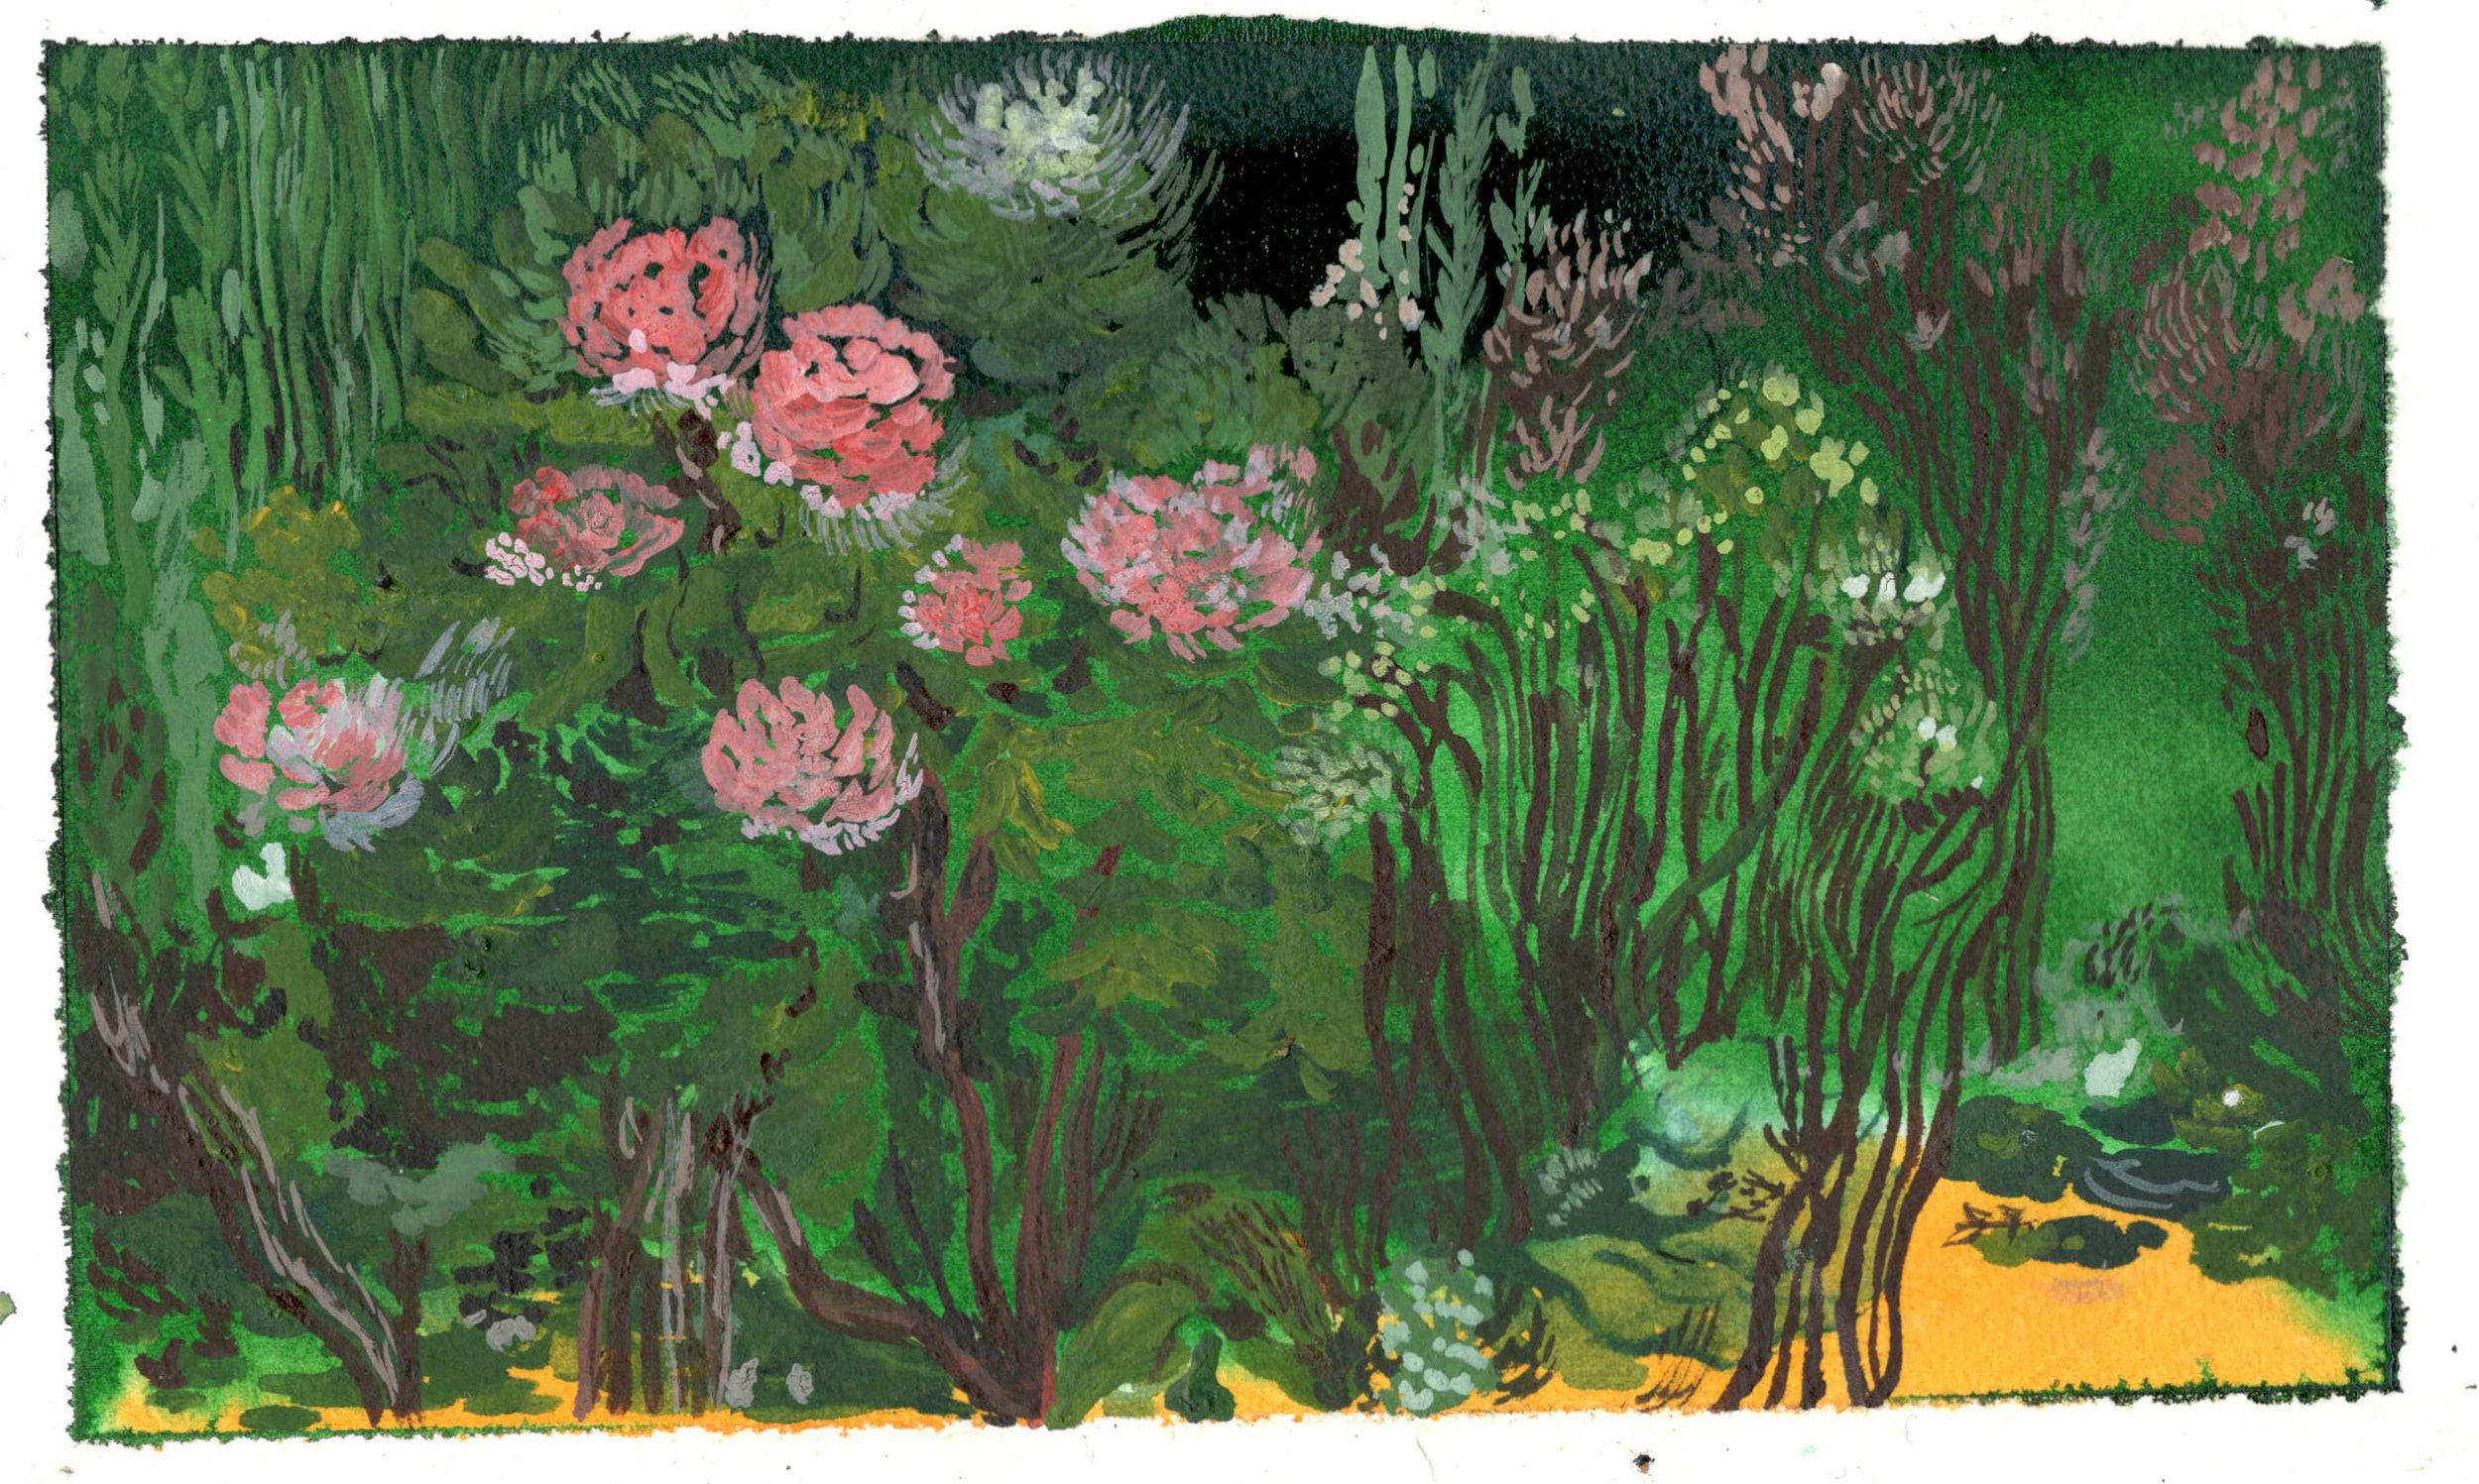 garden_nighttime_hellberg  copy.jpg